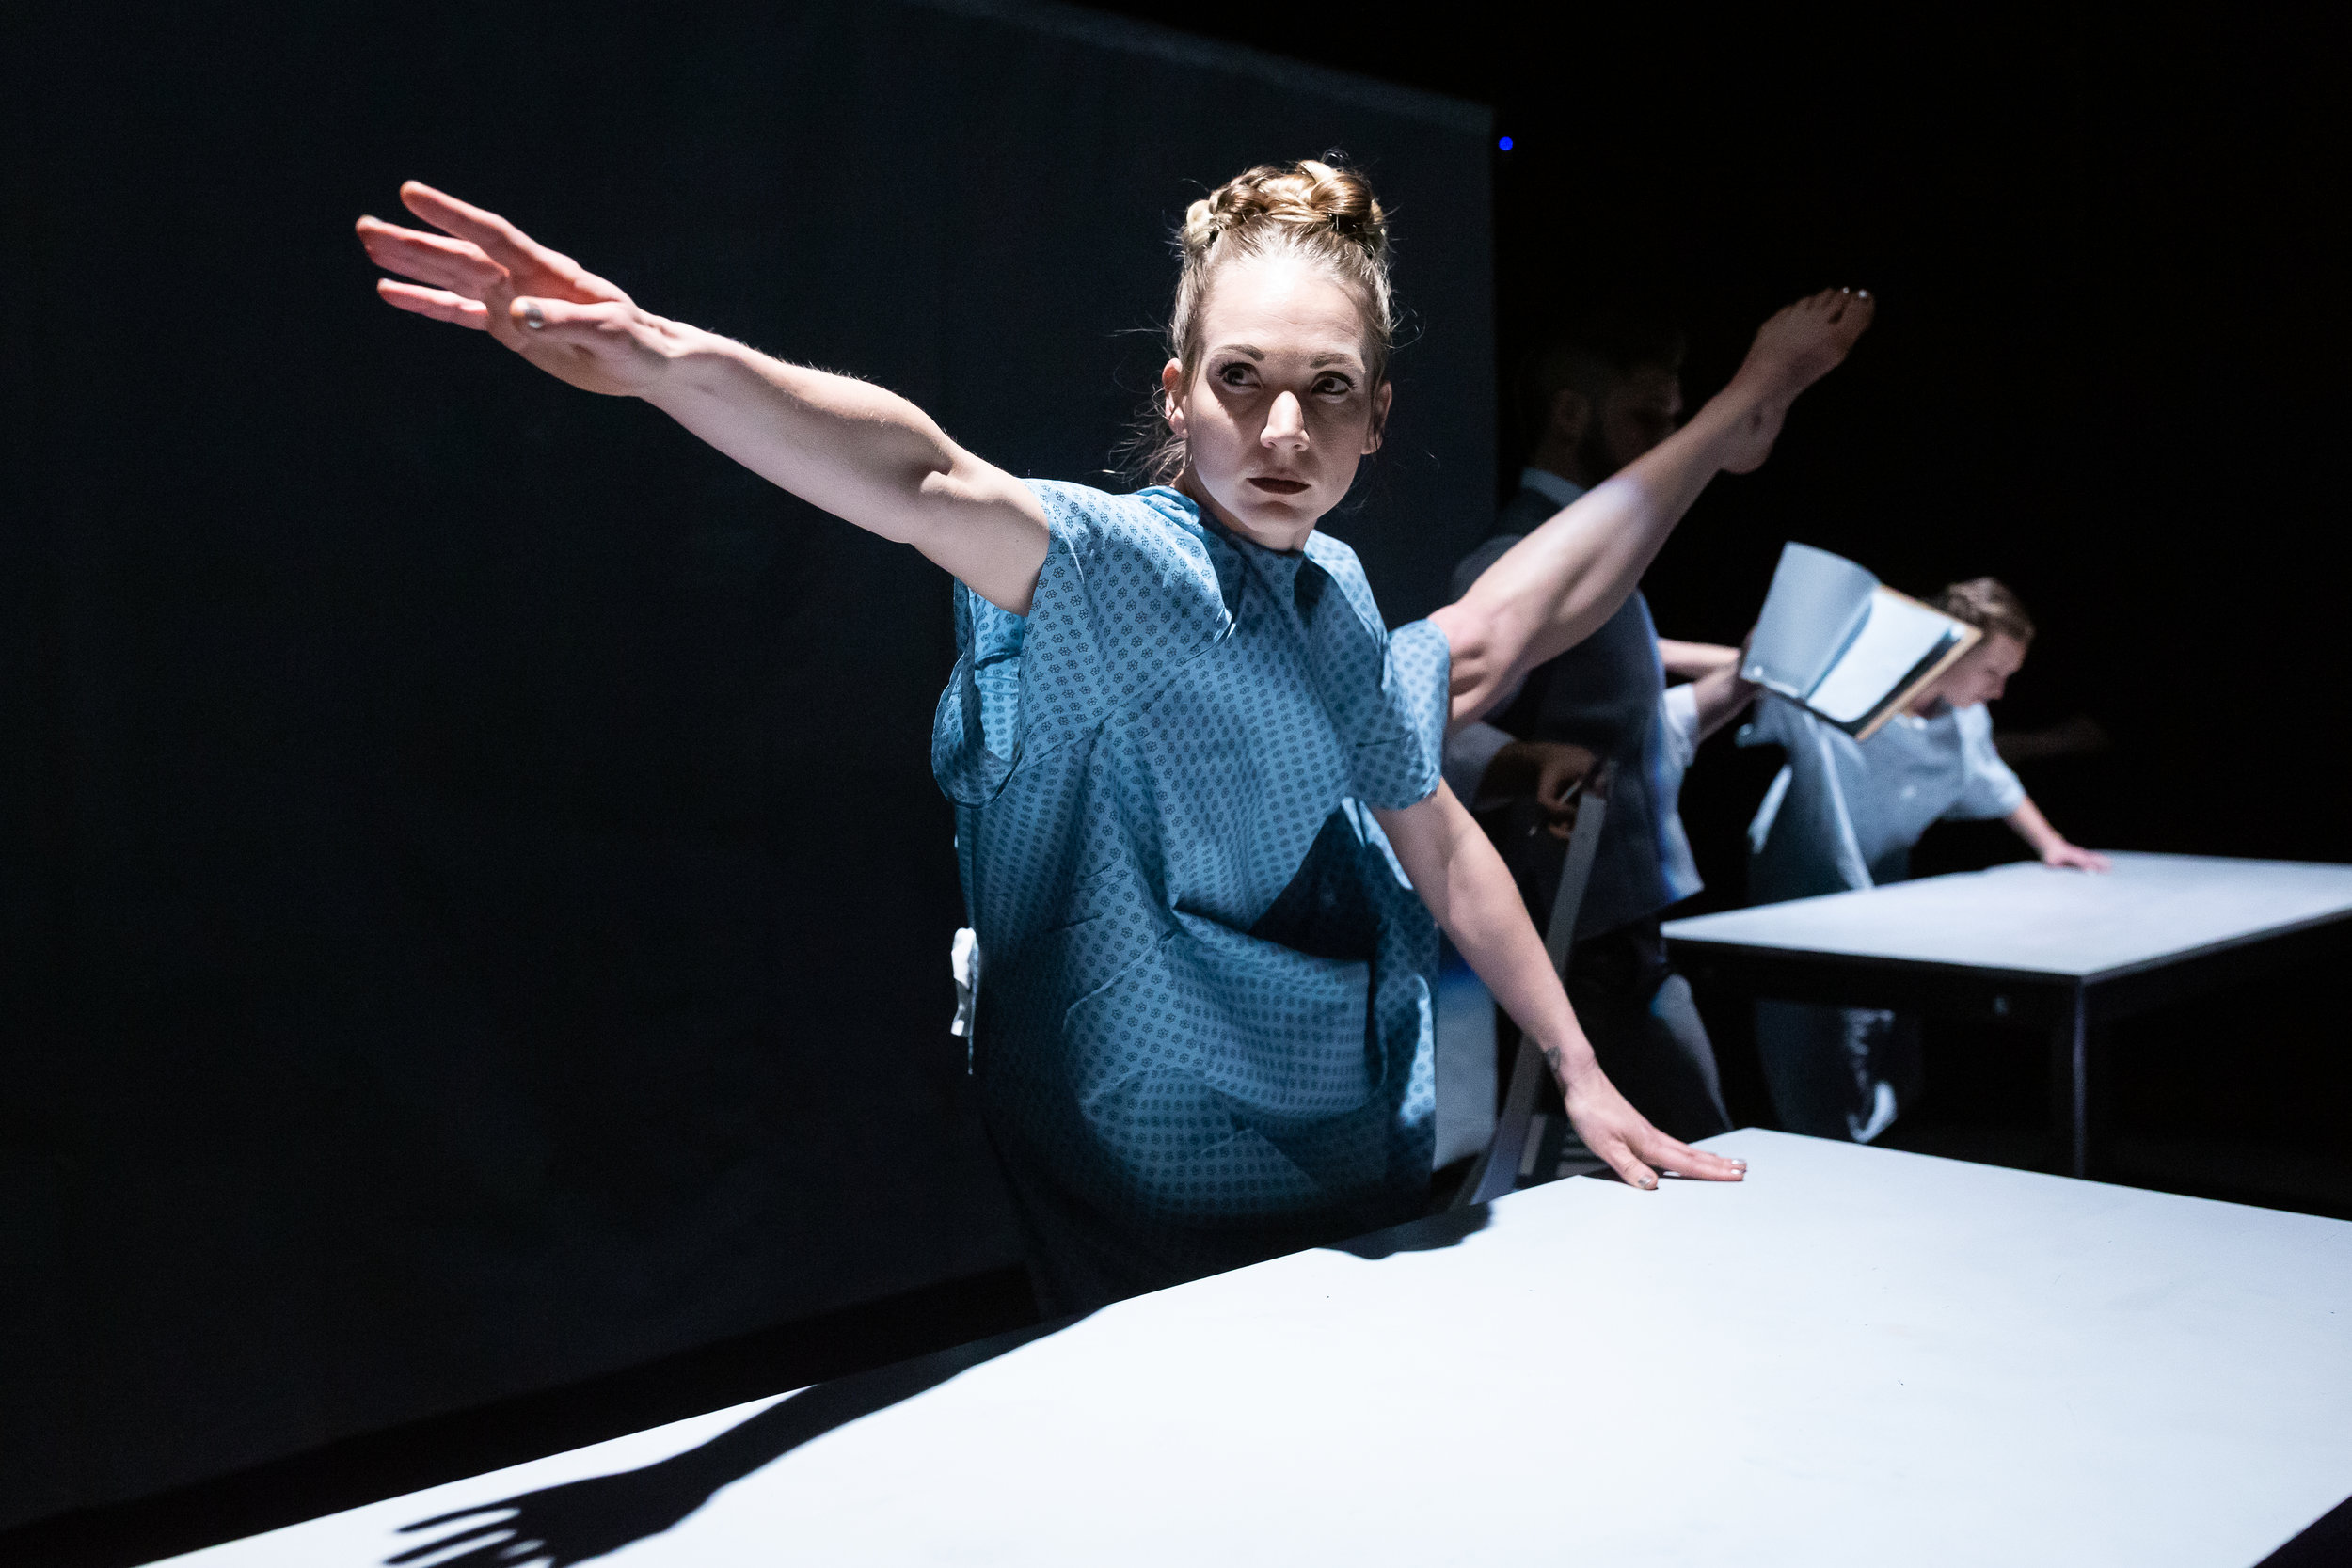 Open Dance Project - Panopticon - Photographer Lynn Lane - Hi Res-18.jpg